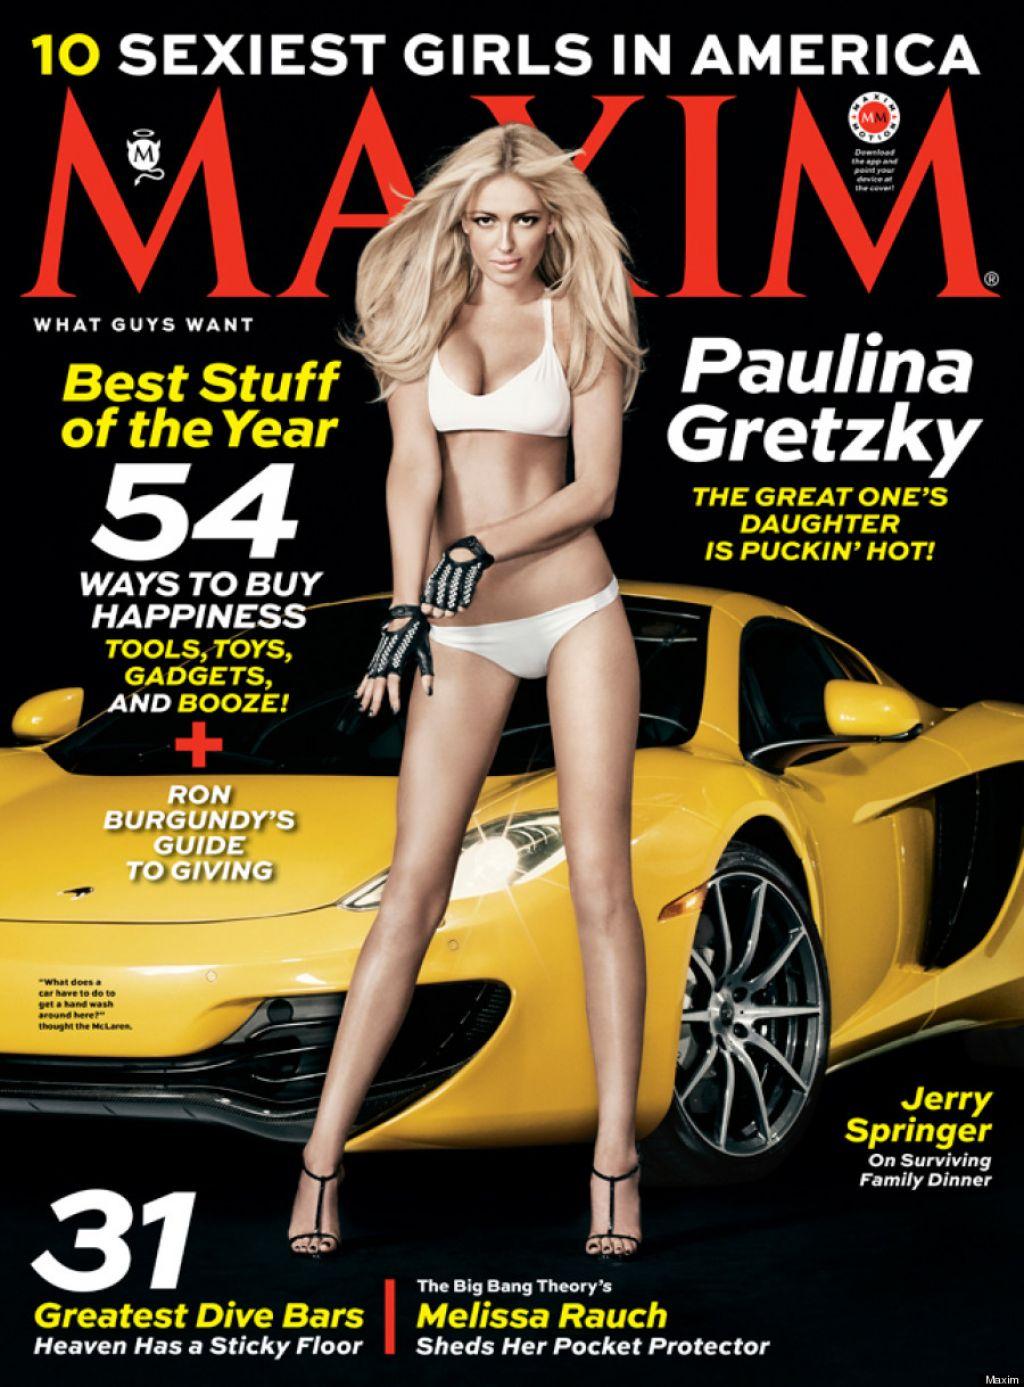 Paulina Gretzky Cover Girld - MAXIM Magazine - December 2013 Issue